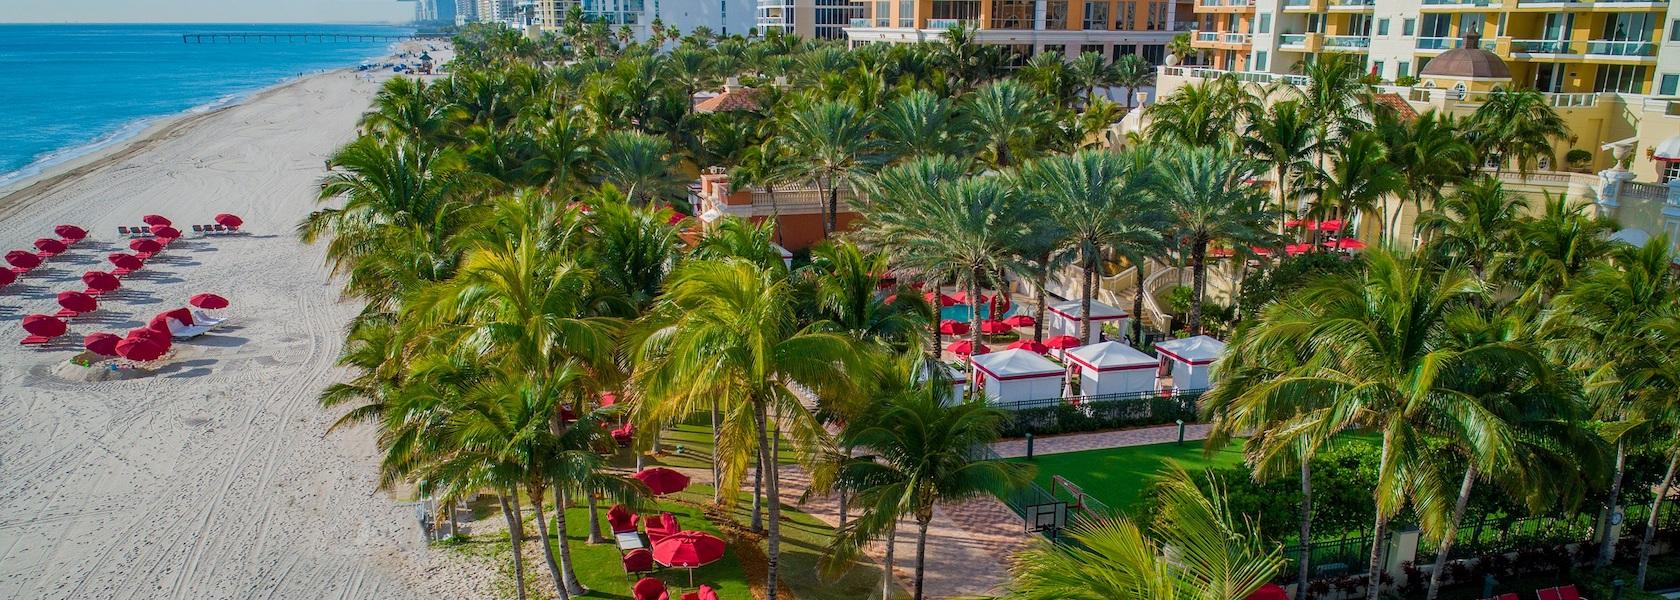 Acqualina Beachside Courtyard